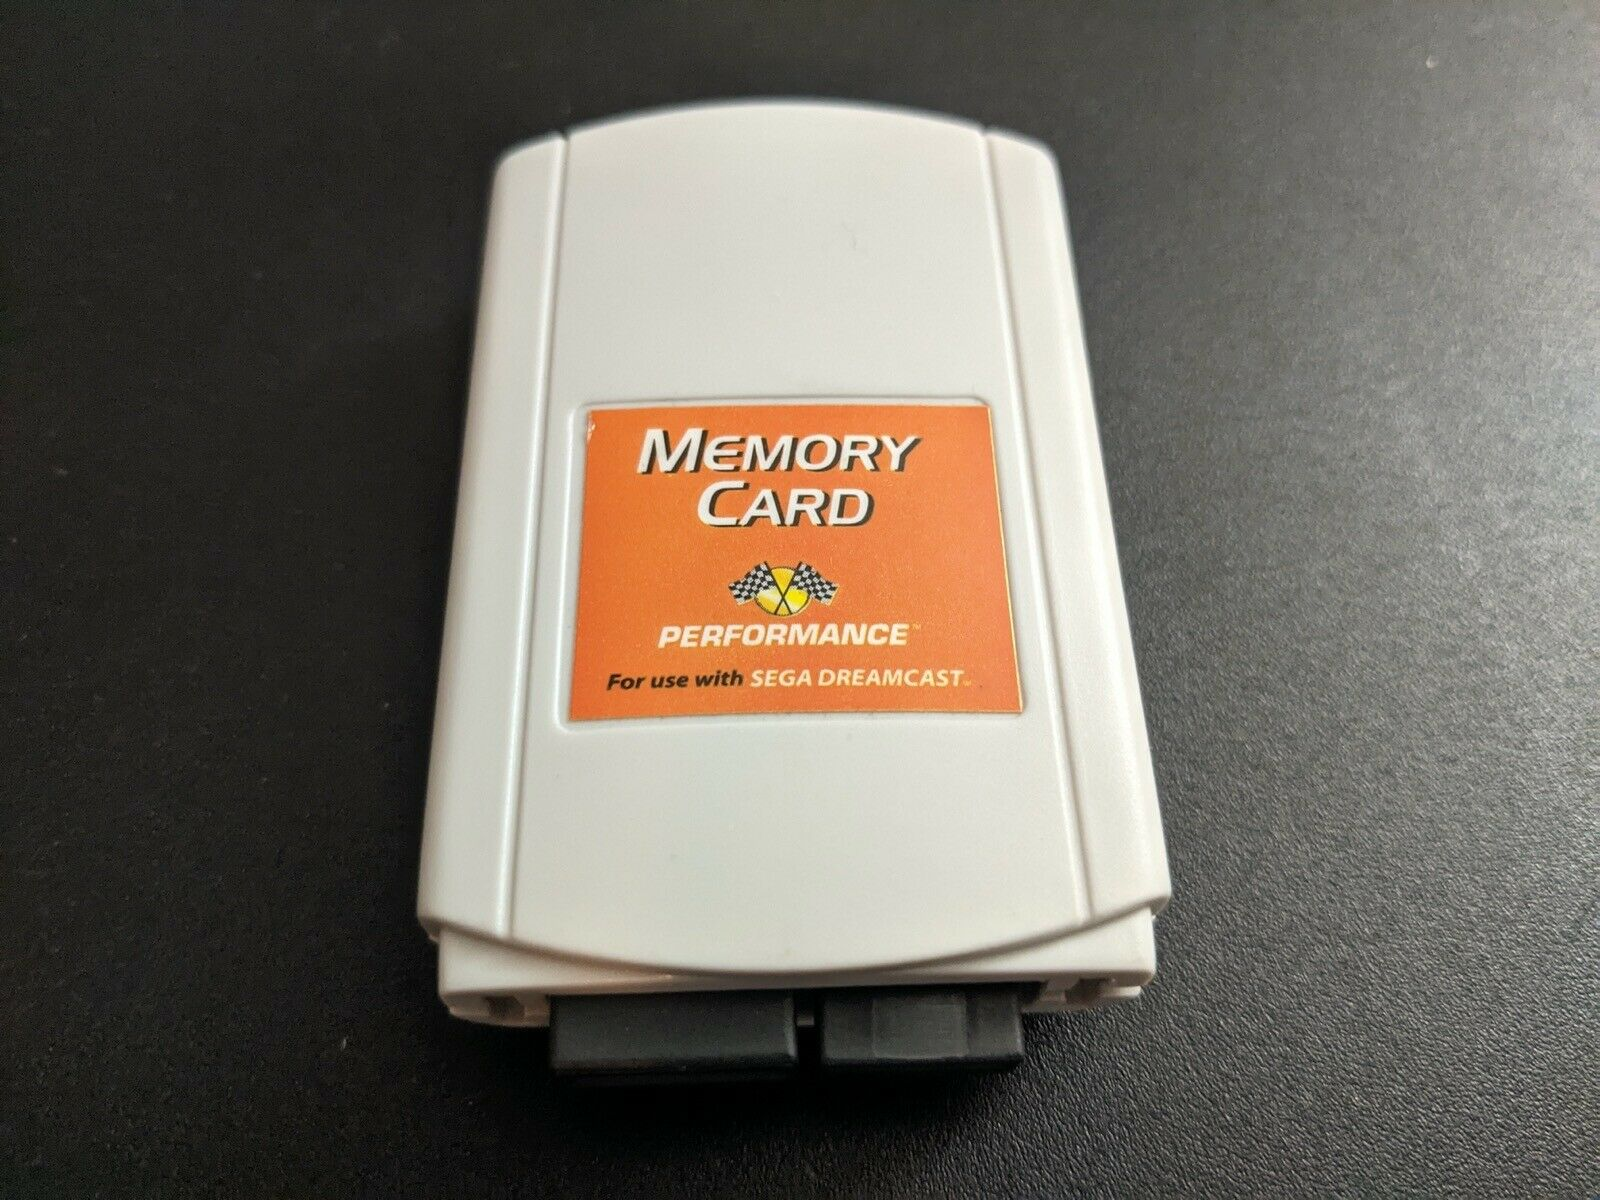 Performance Sega Dreamcast Memory Card Very Good Condition P-20-316